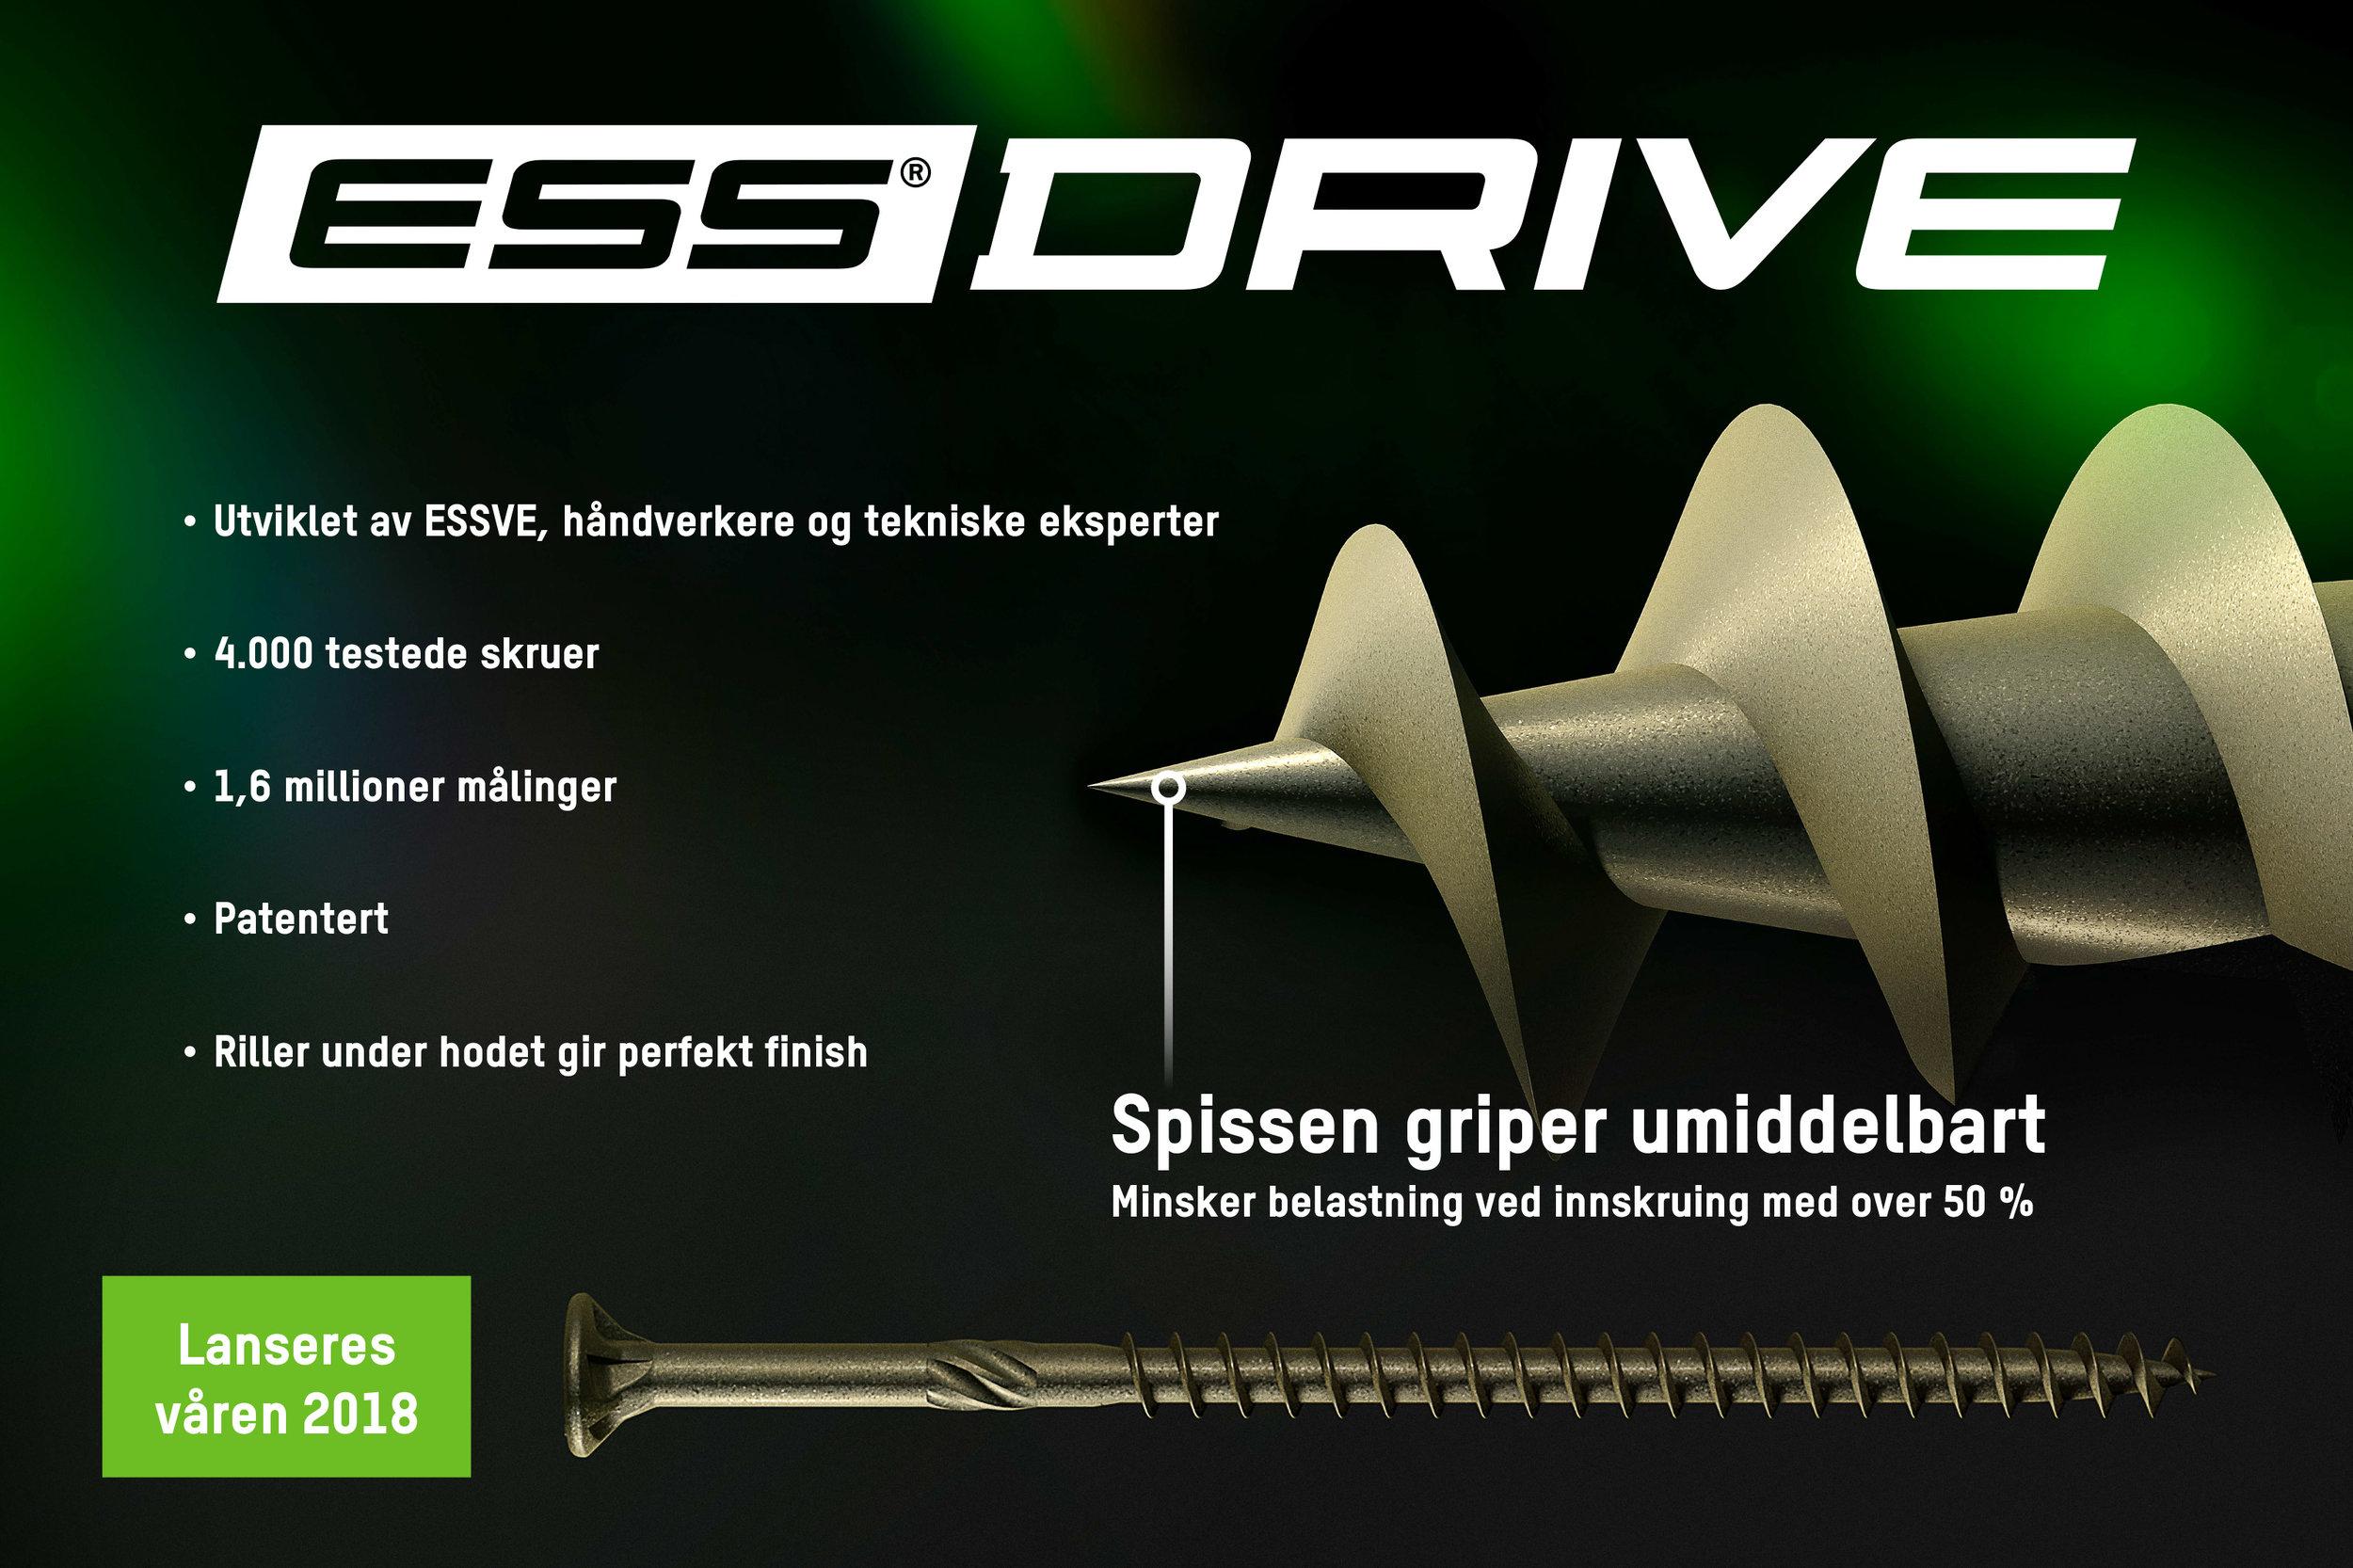 Forhåndsvisning-ESSVE-messe-GREEN-300x200-RGB-2.jpg